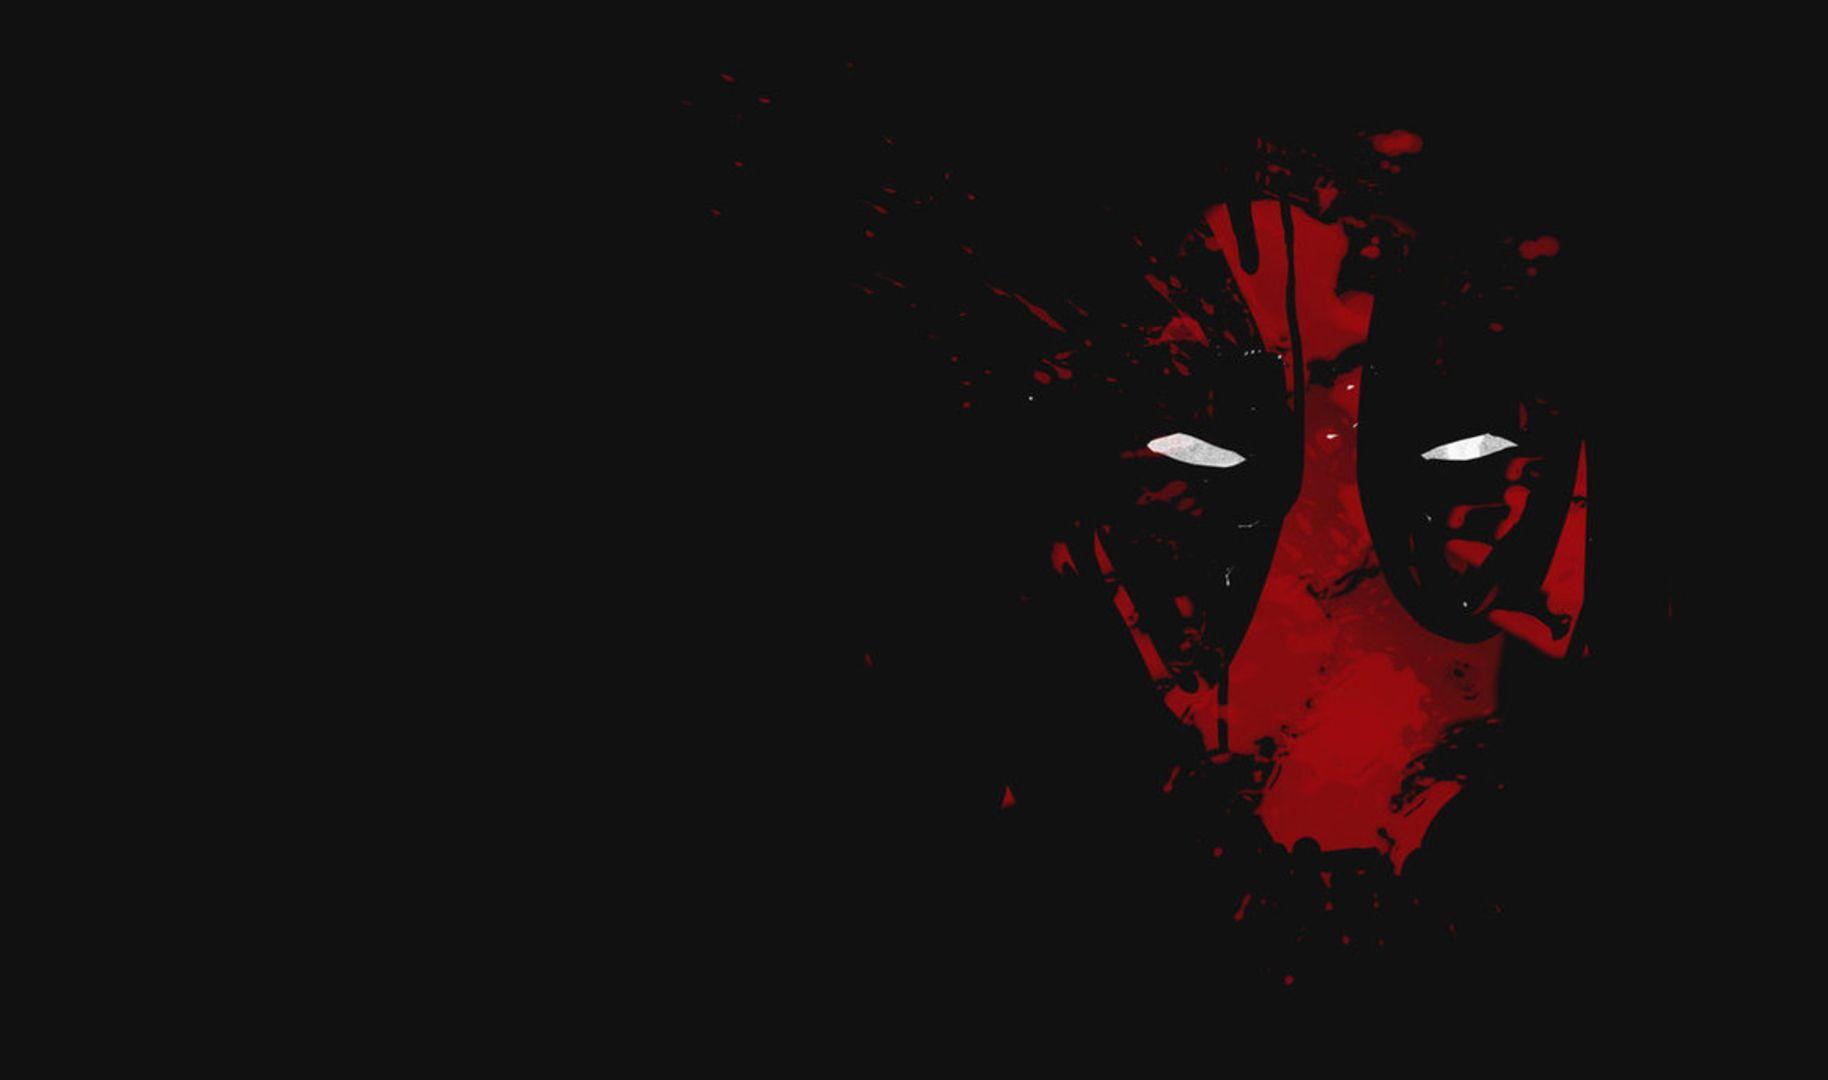 Deadpool Logo Wallpaper Deadpool Wallpaper 4k Wallpapers For Pc